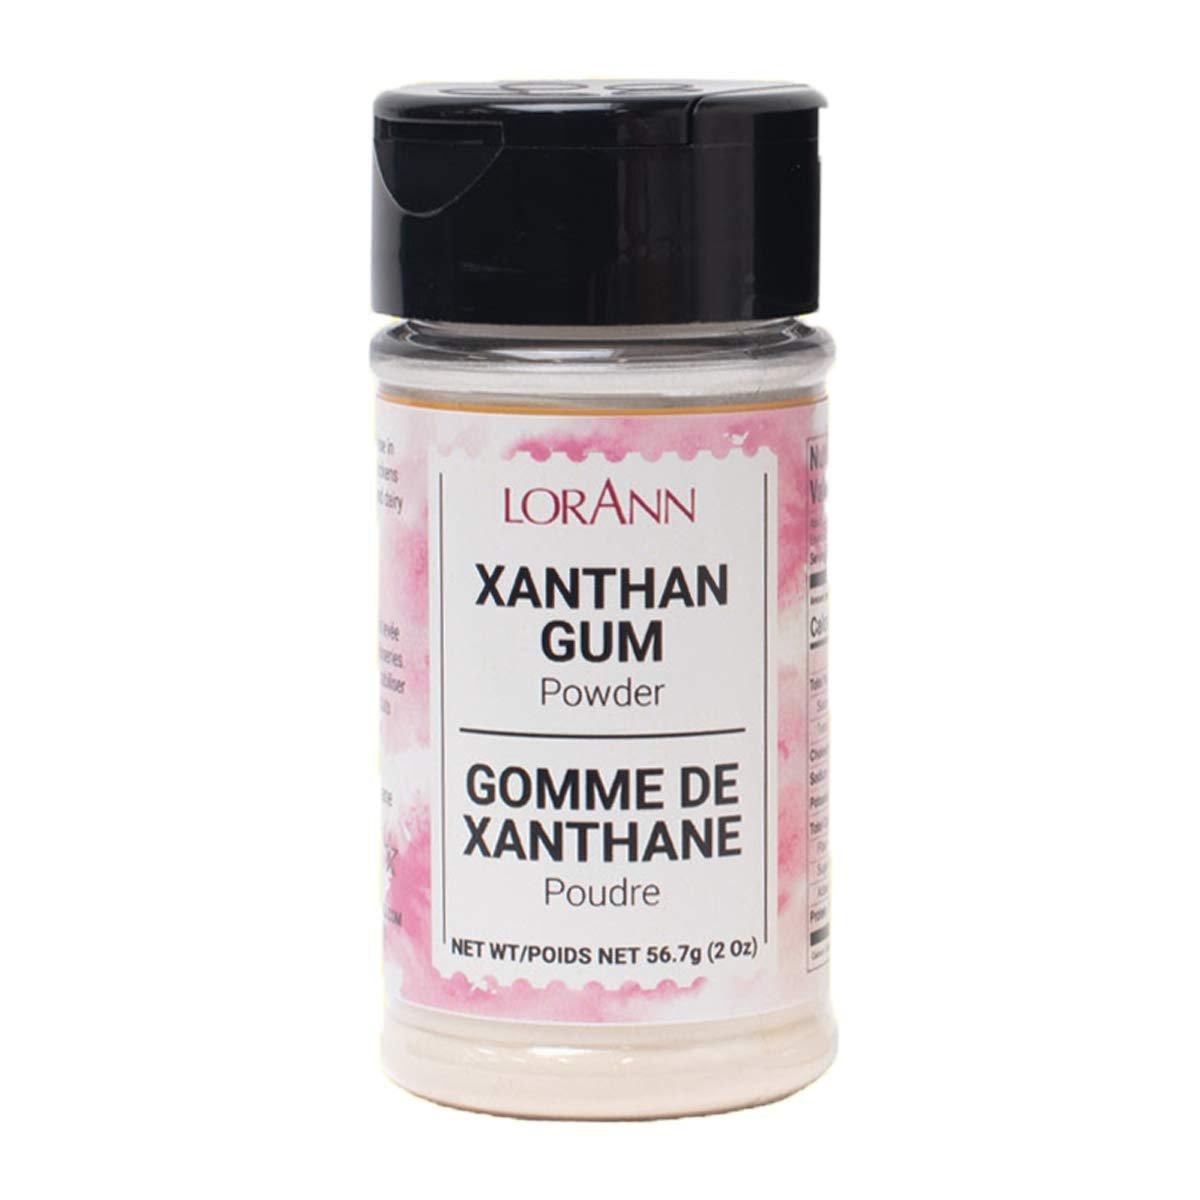 Xanthan Gum Powder 2oz